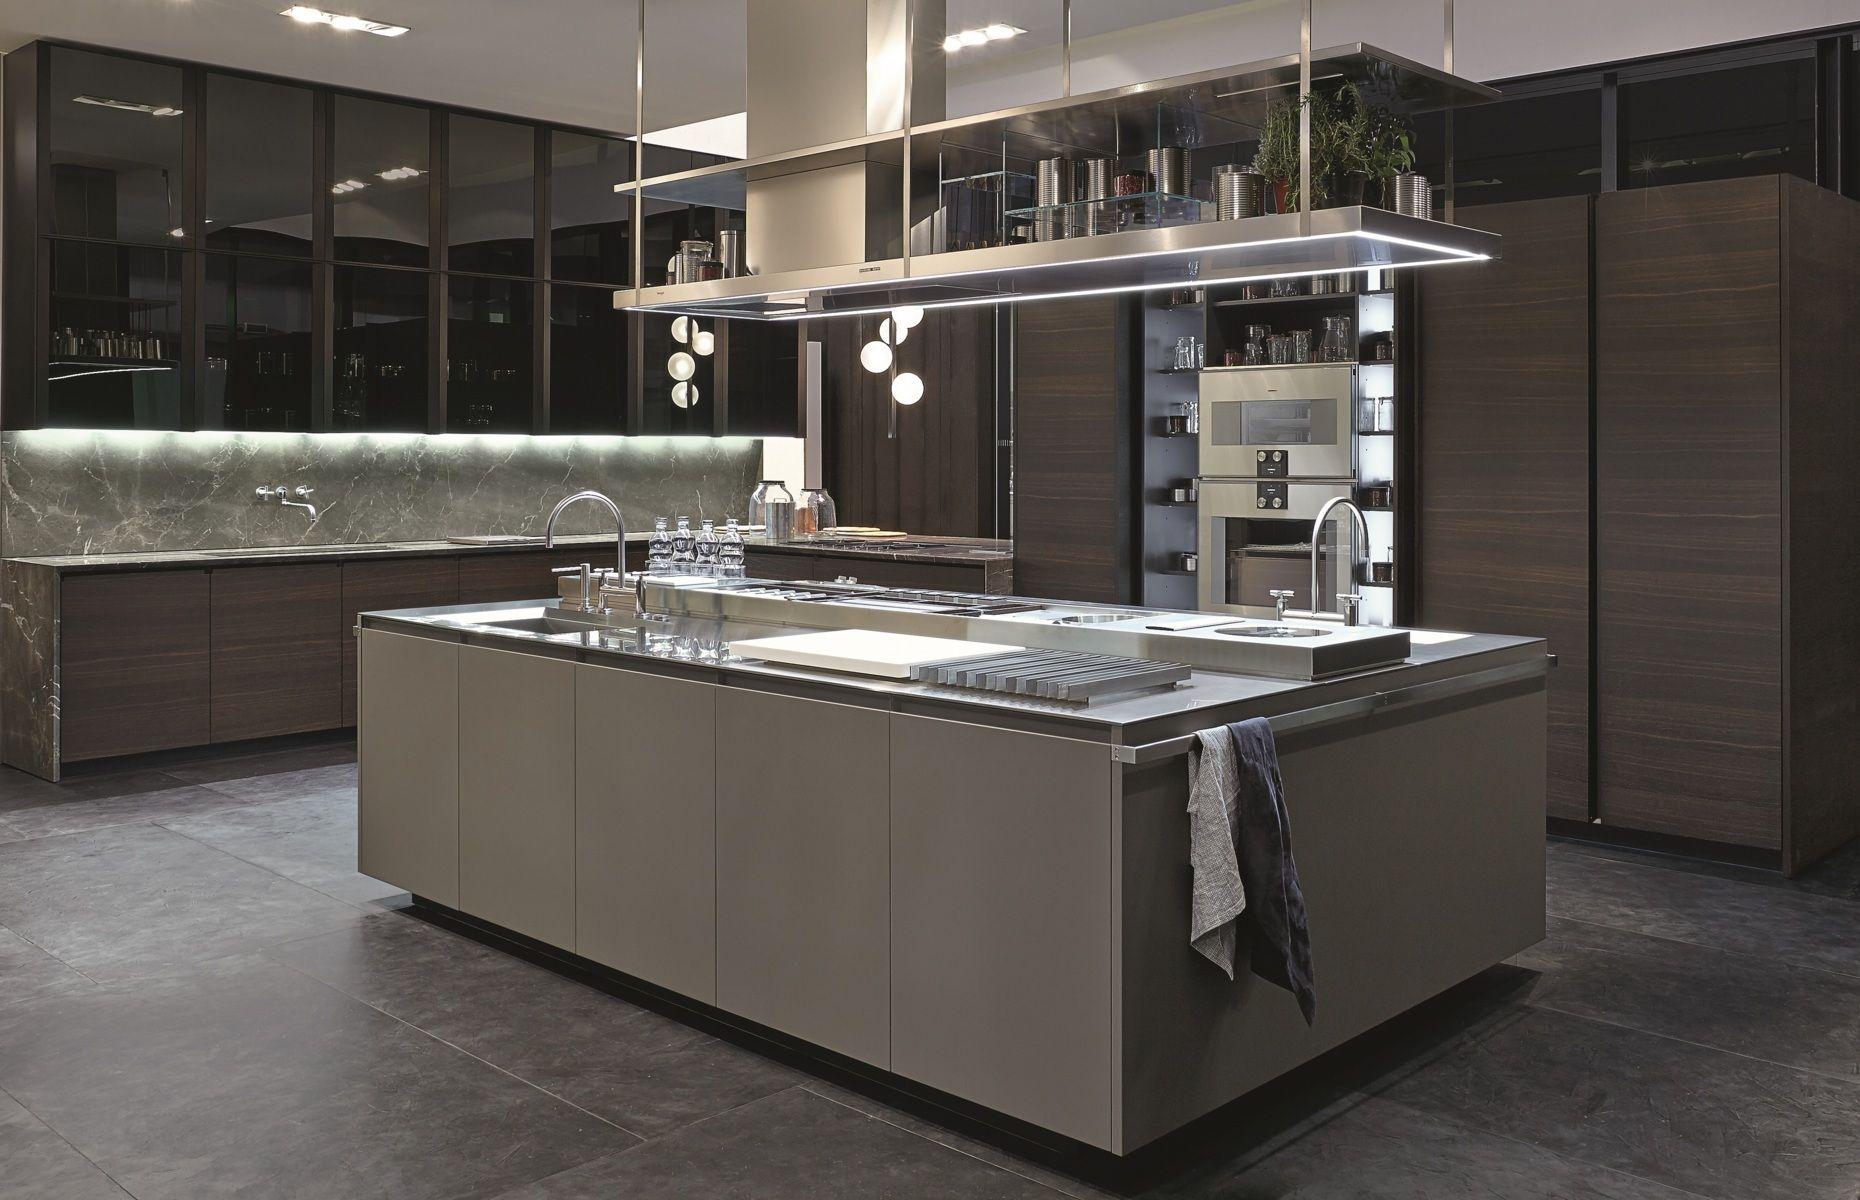 Poliform Varenna Trail Kitchen Interni Della Cucina Progettazione Di Una Cucina Moderna Design Cucine